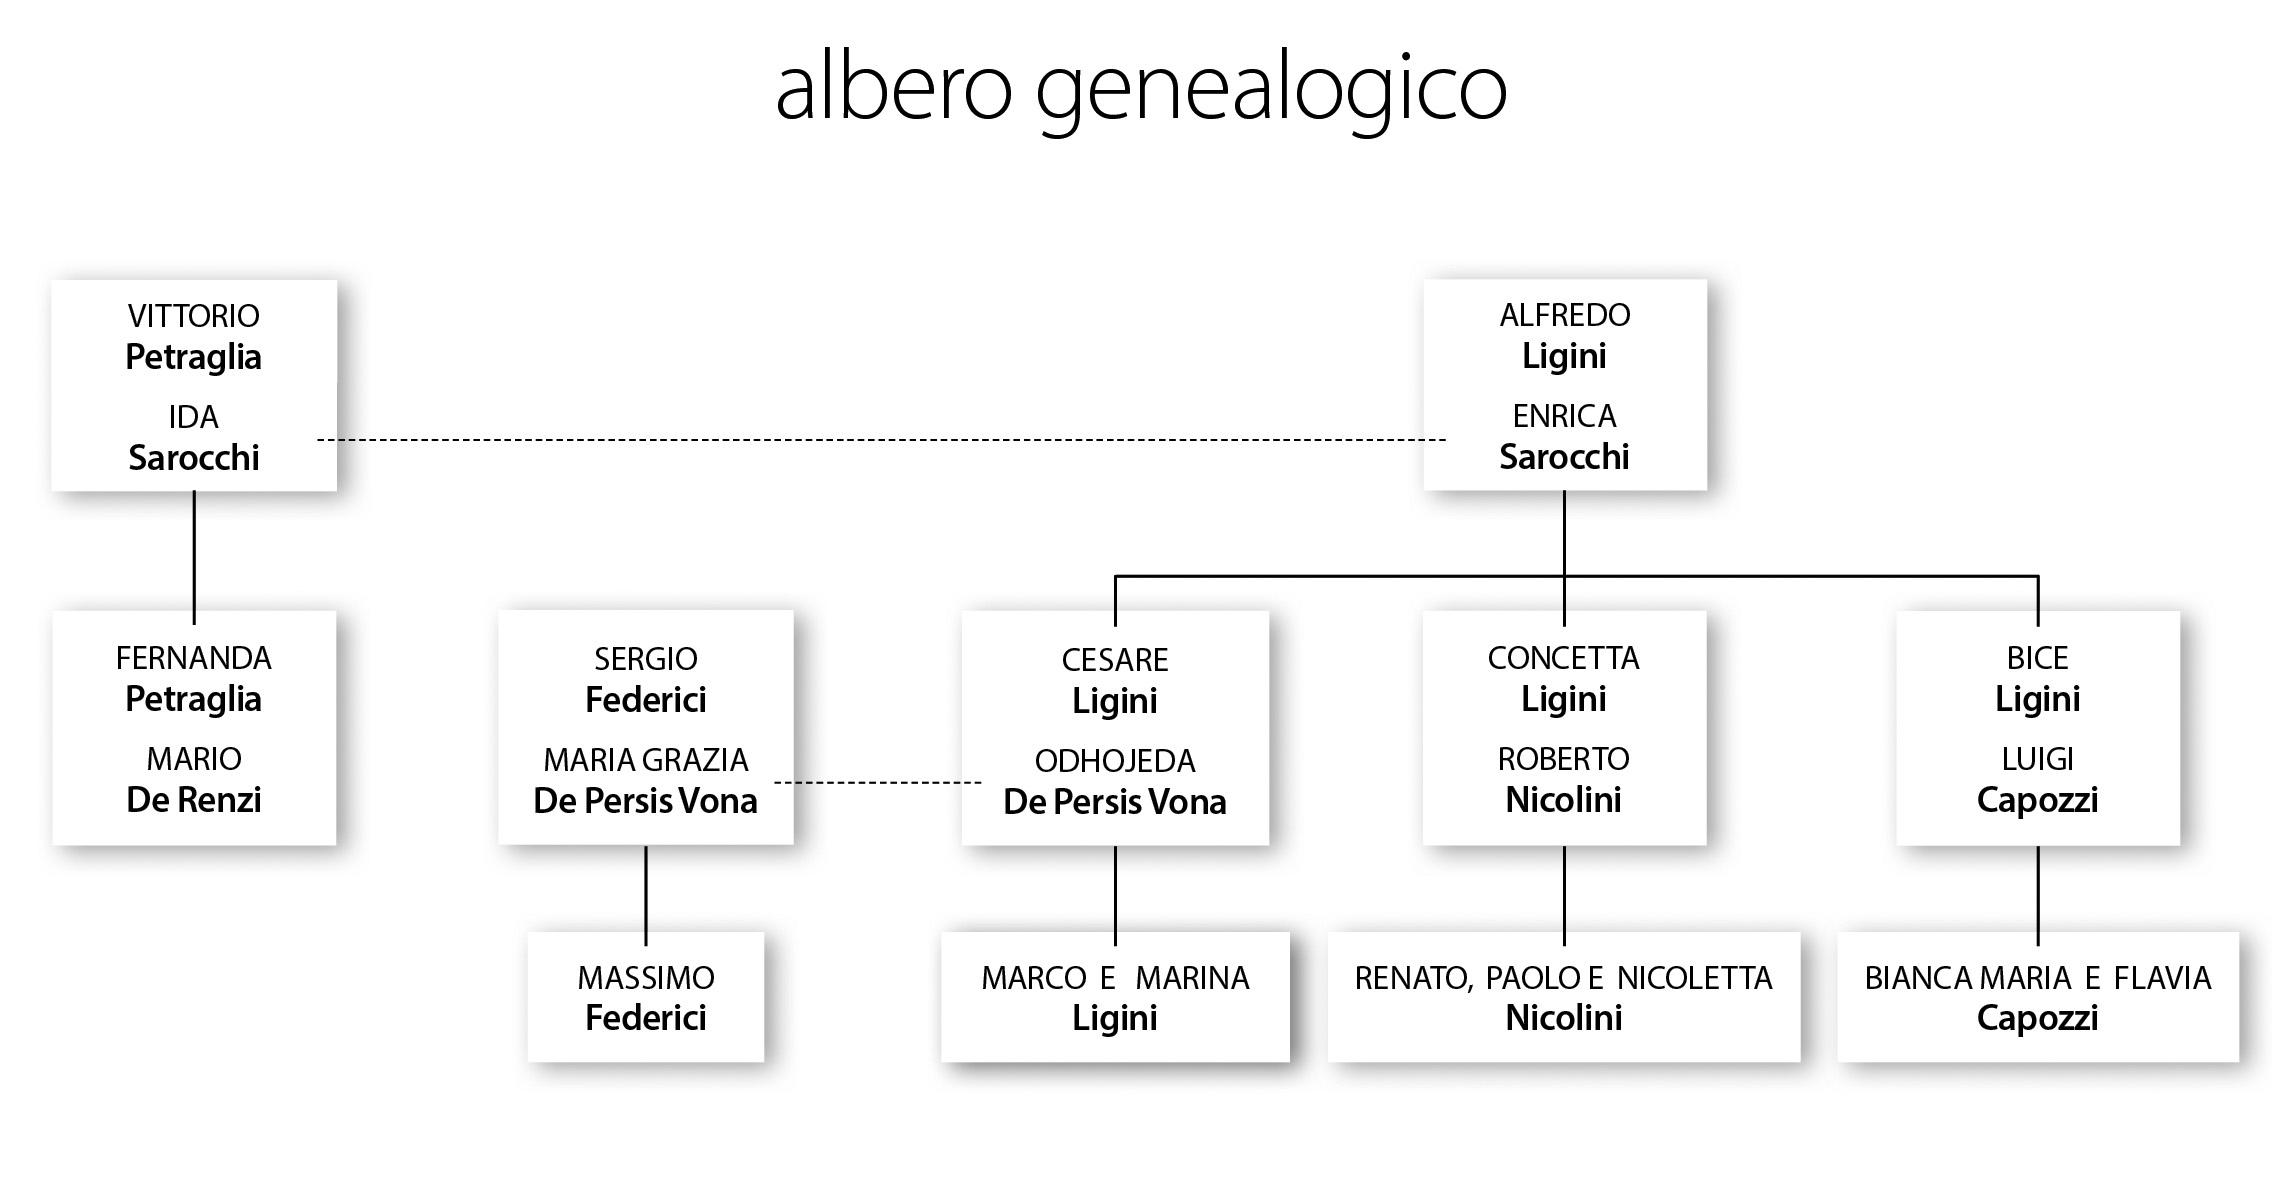 albero genealogico italiano